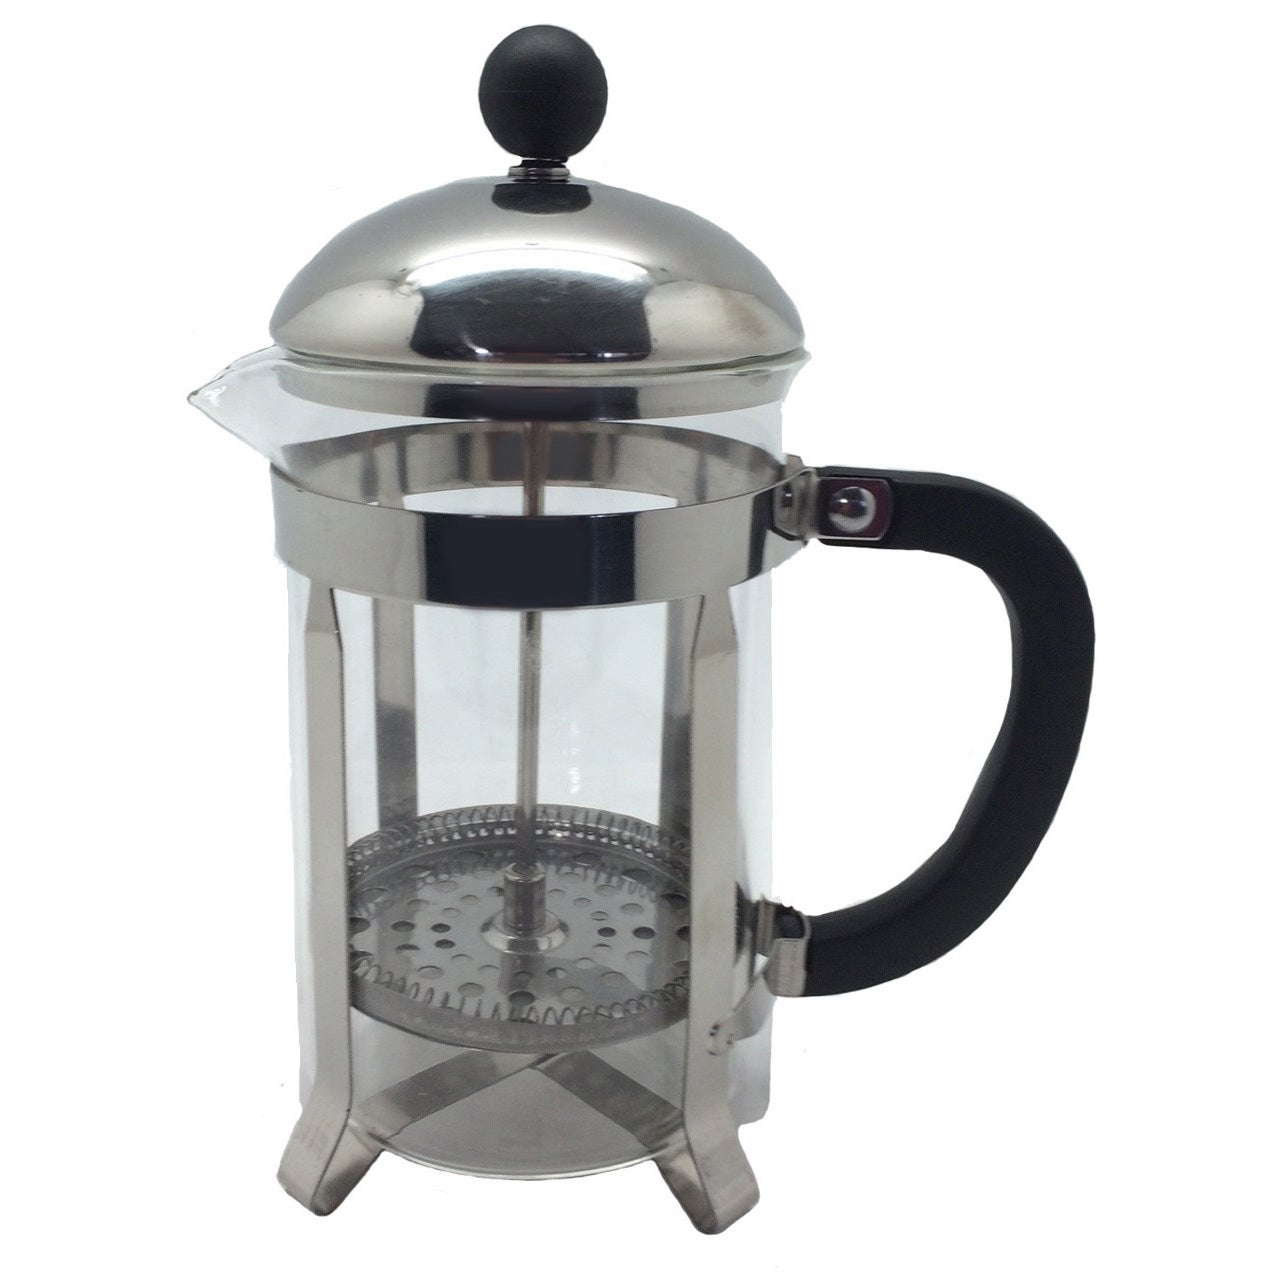 Wee's Beyond Brew-Fresh Stainless Steel (Silver) Espresso...